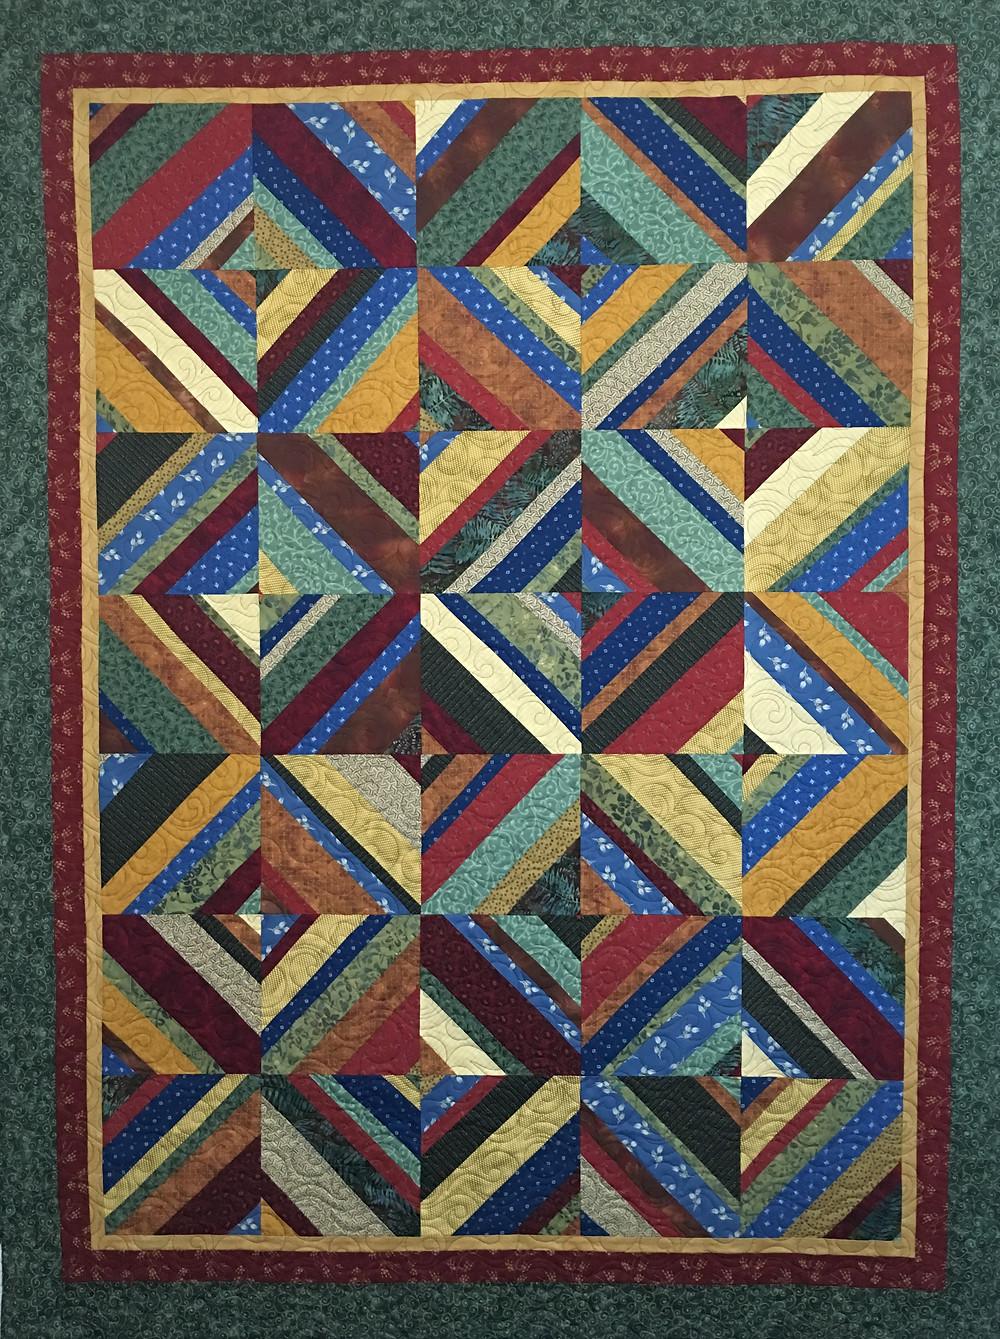 Multi Color Blocks by Andi Hays